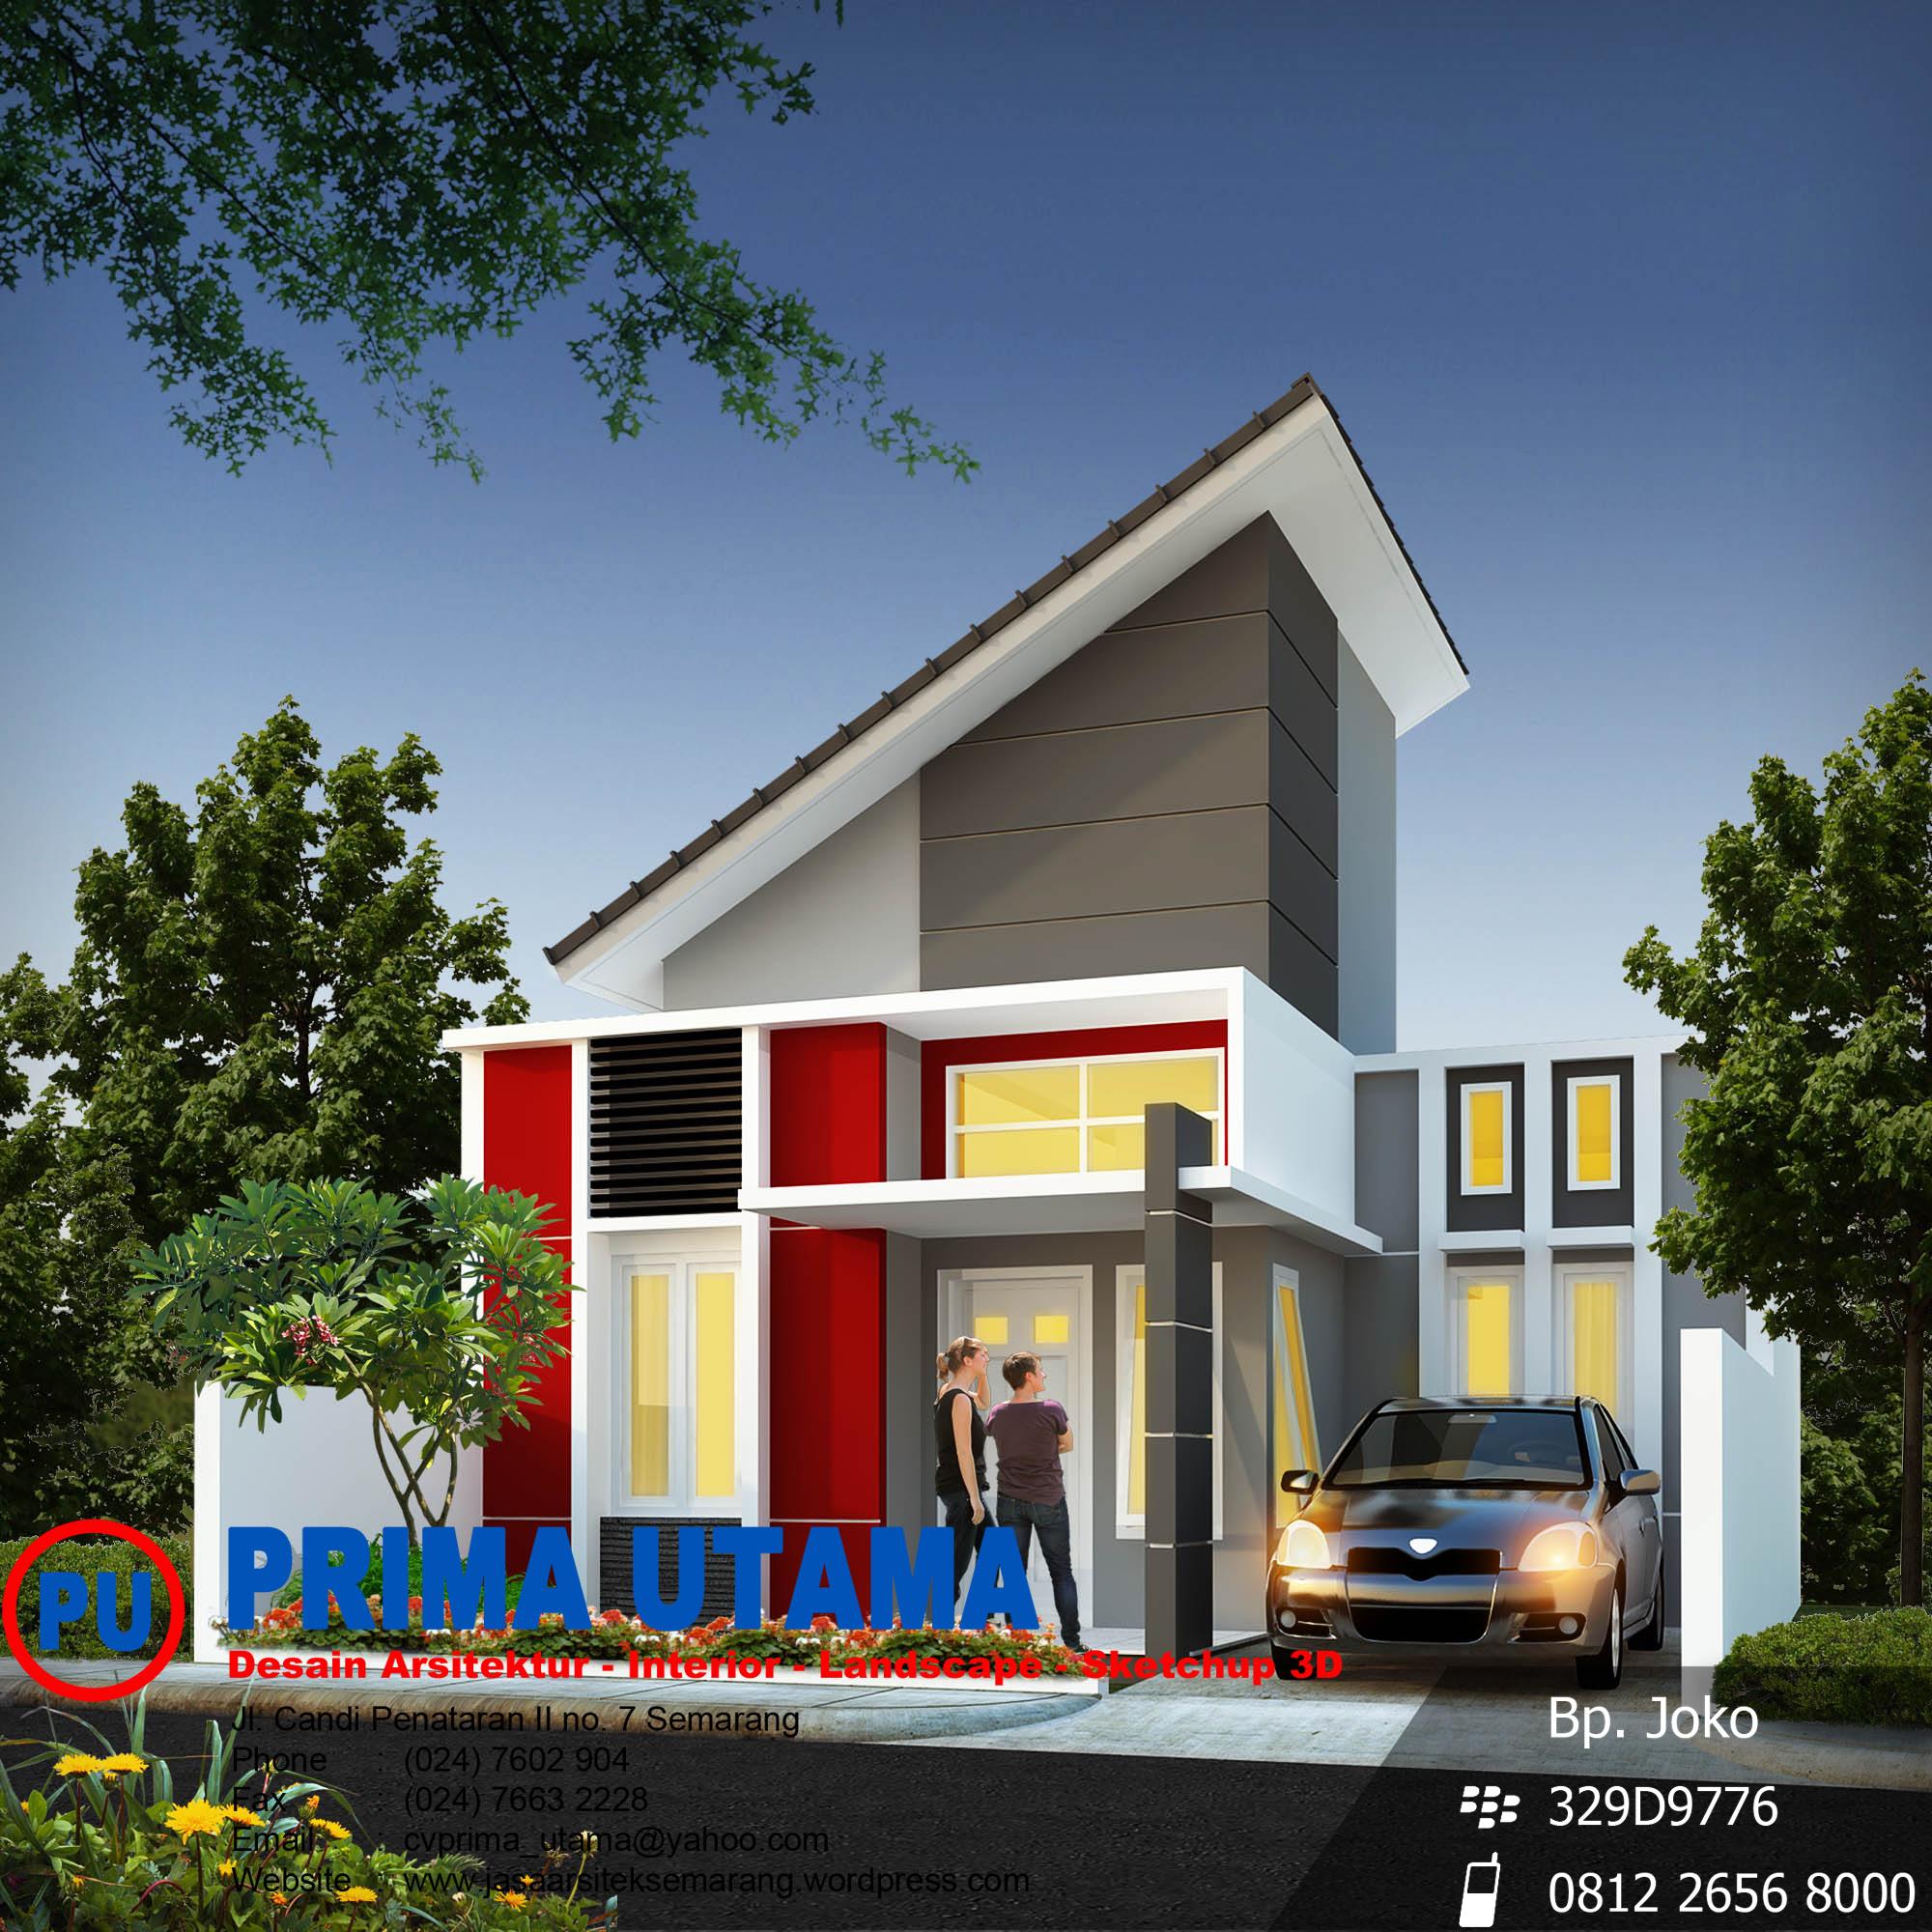 105 Denah Rumah Joglo Modern Minimalis Gambar Desain Rumah Minimalis